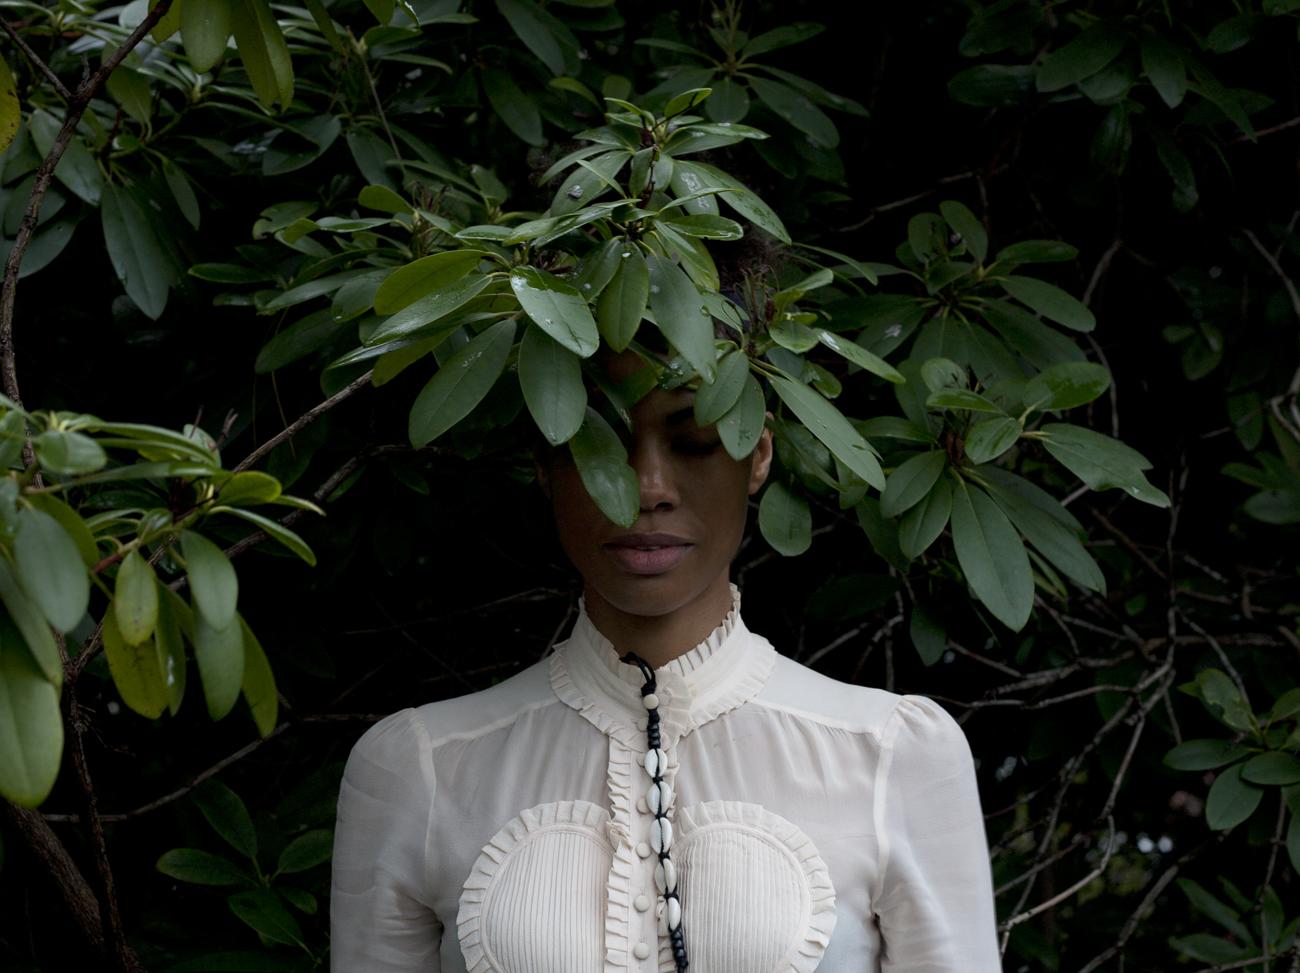 From Zohra Opoku's Self Portrait series